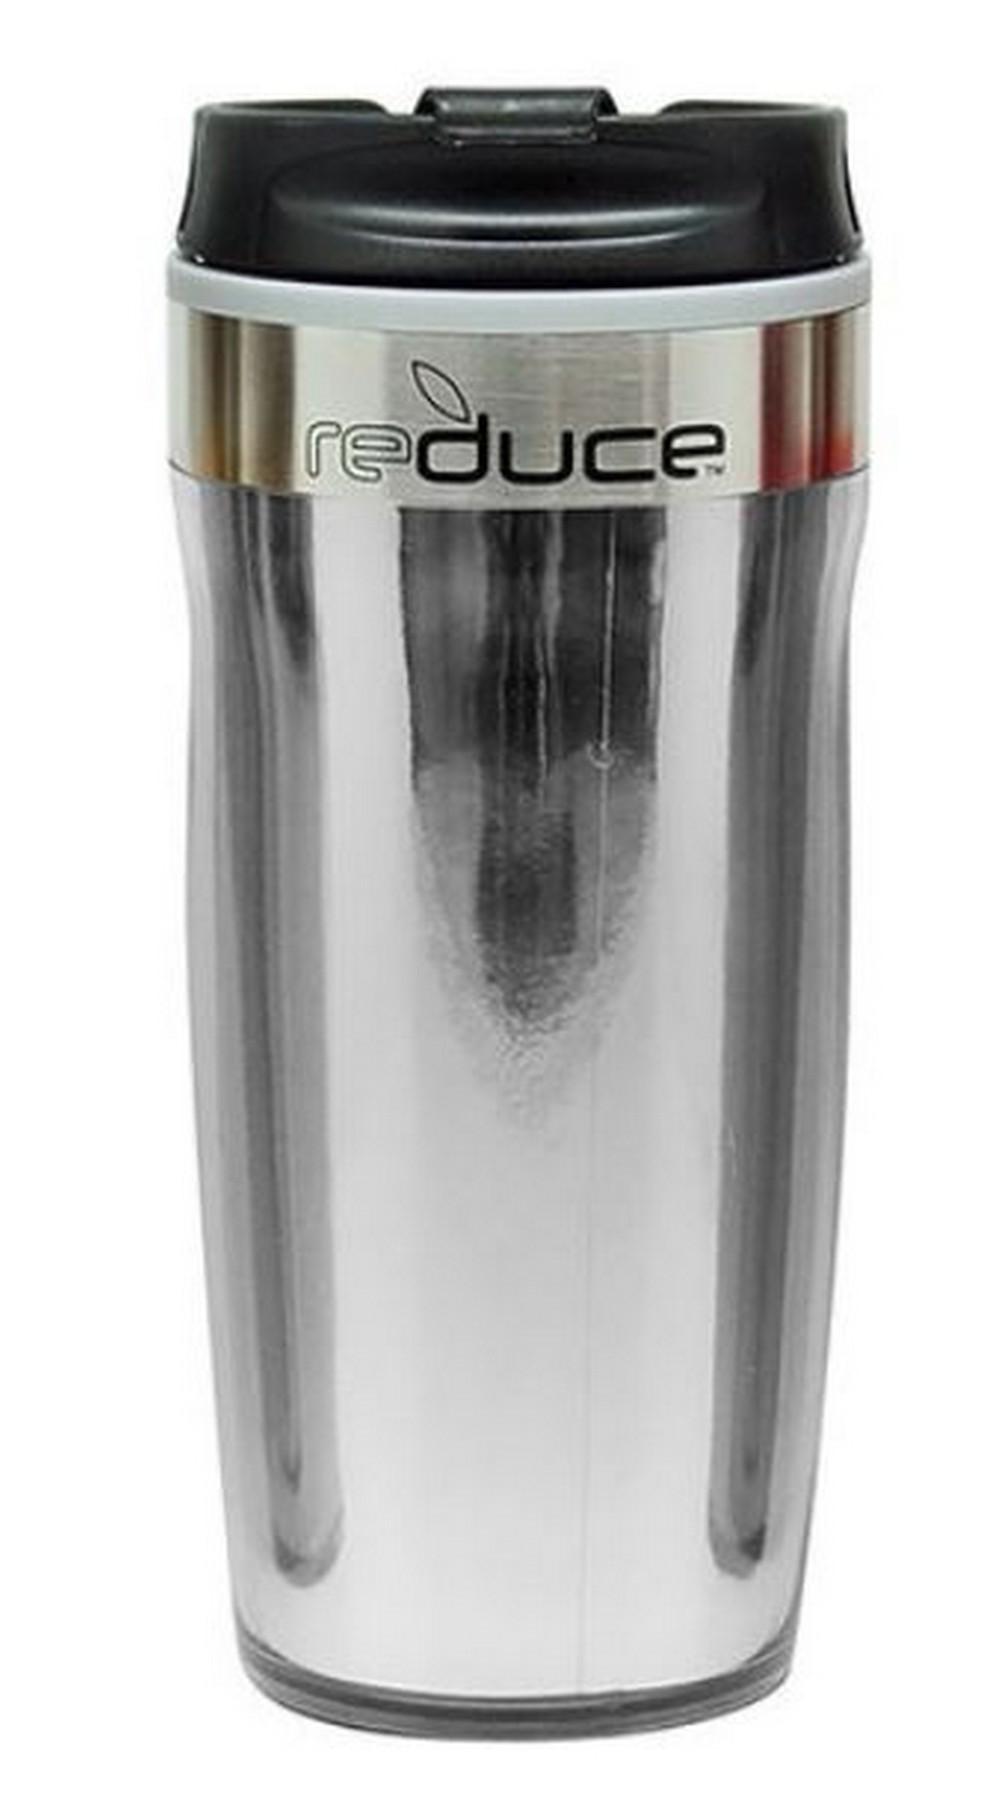 Reduce Dash 16 Oz Thermal Tumbler Cup Mug Coffee Cup